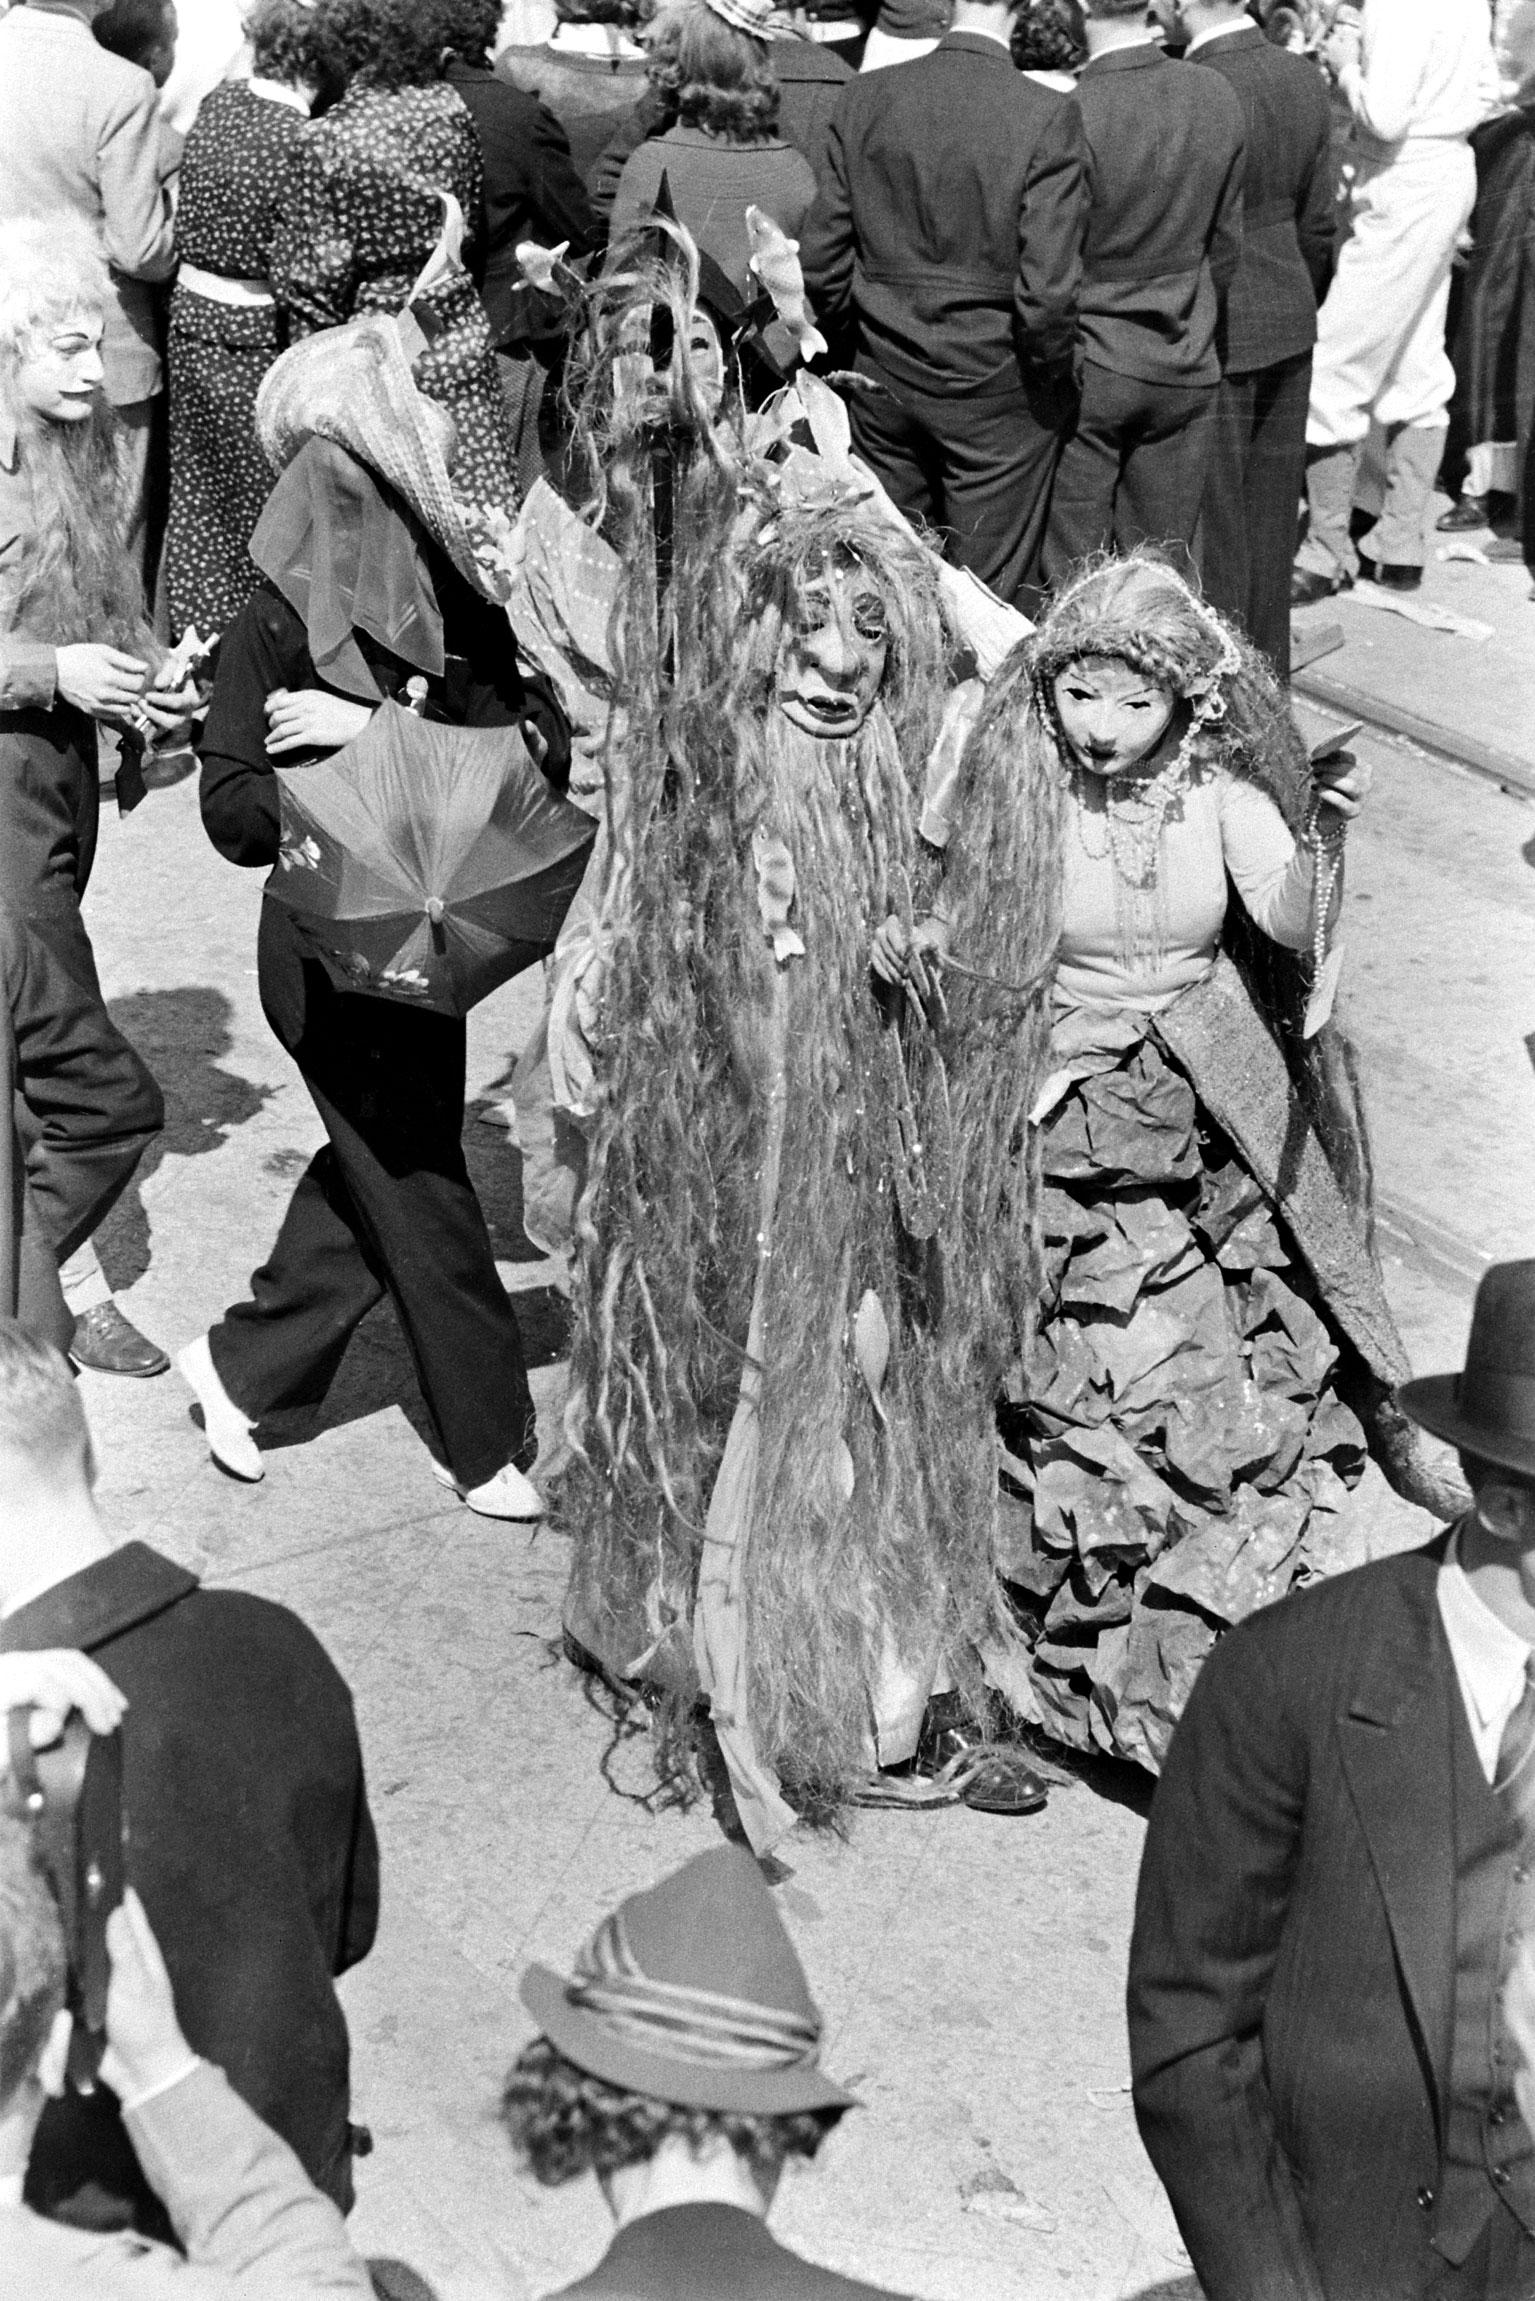 Mardi Gras costumes, New Orleans, 1938.